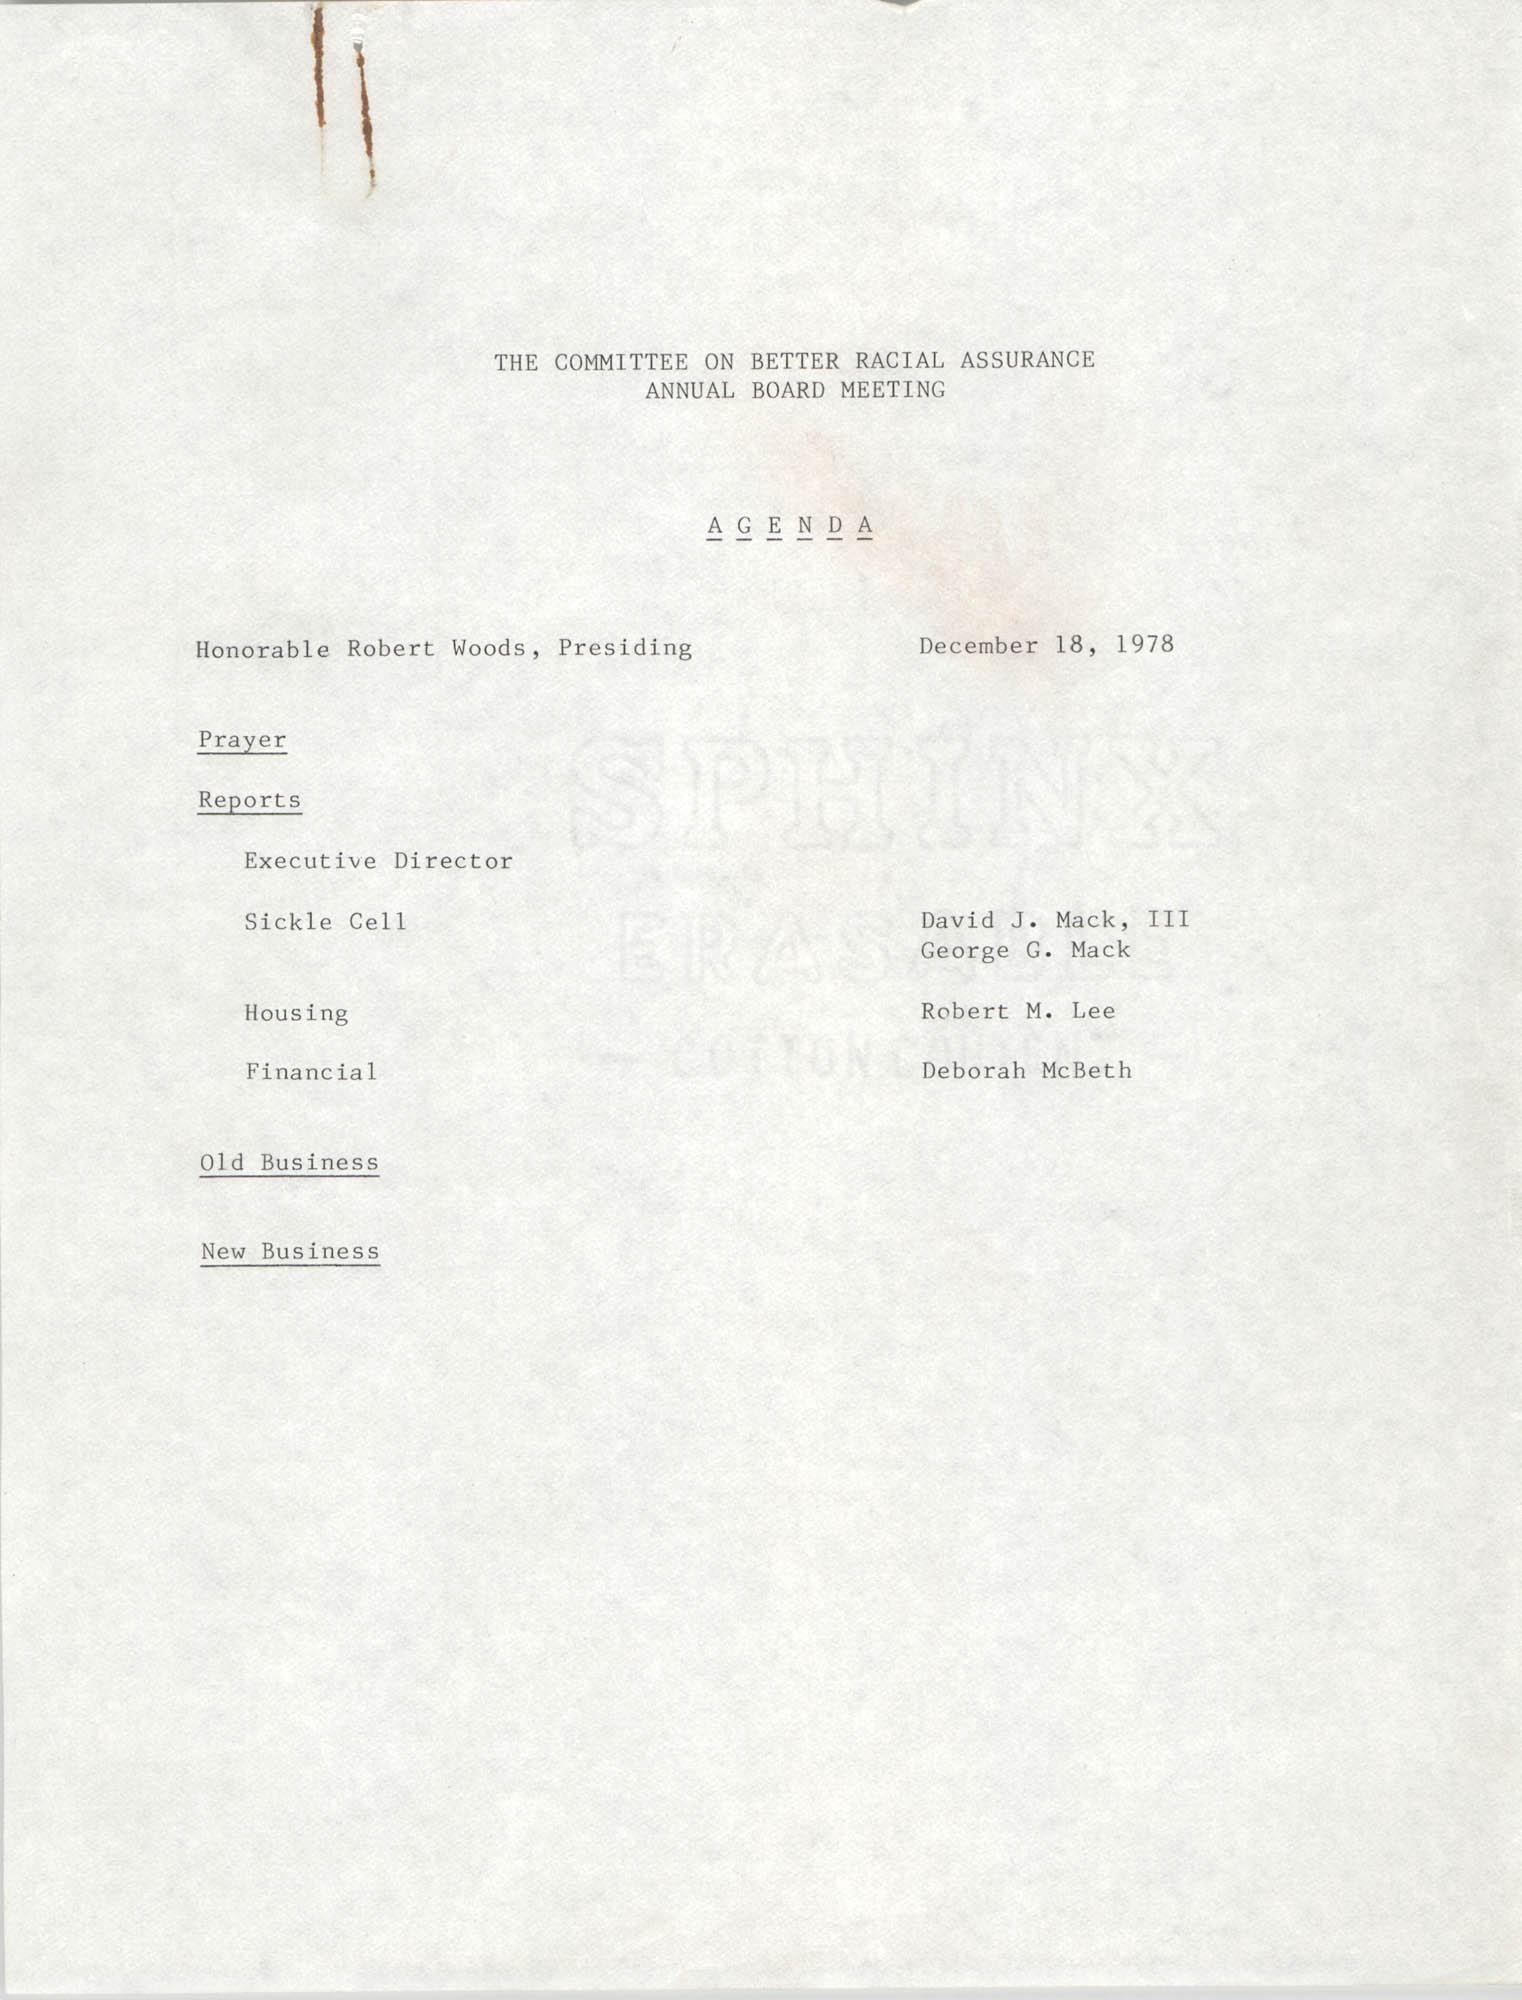 COBRA Agenda, December 18, 1978